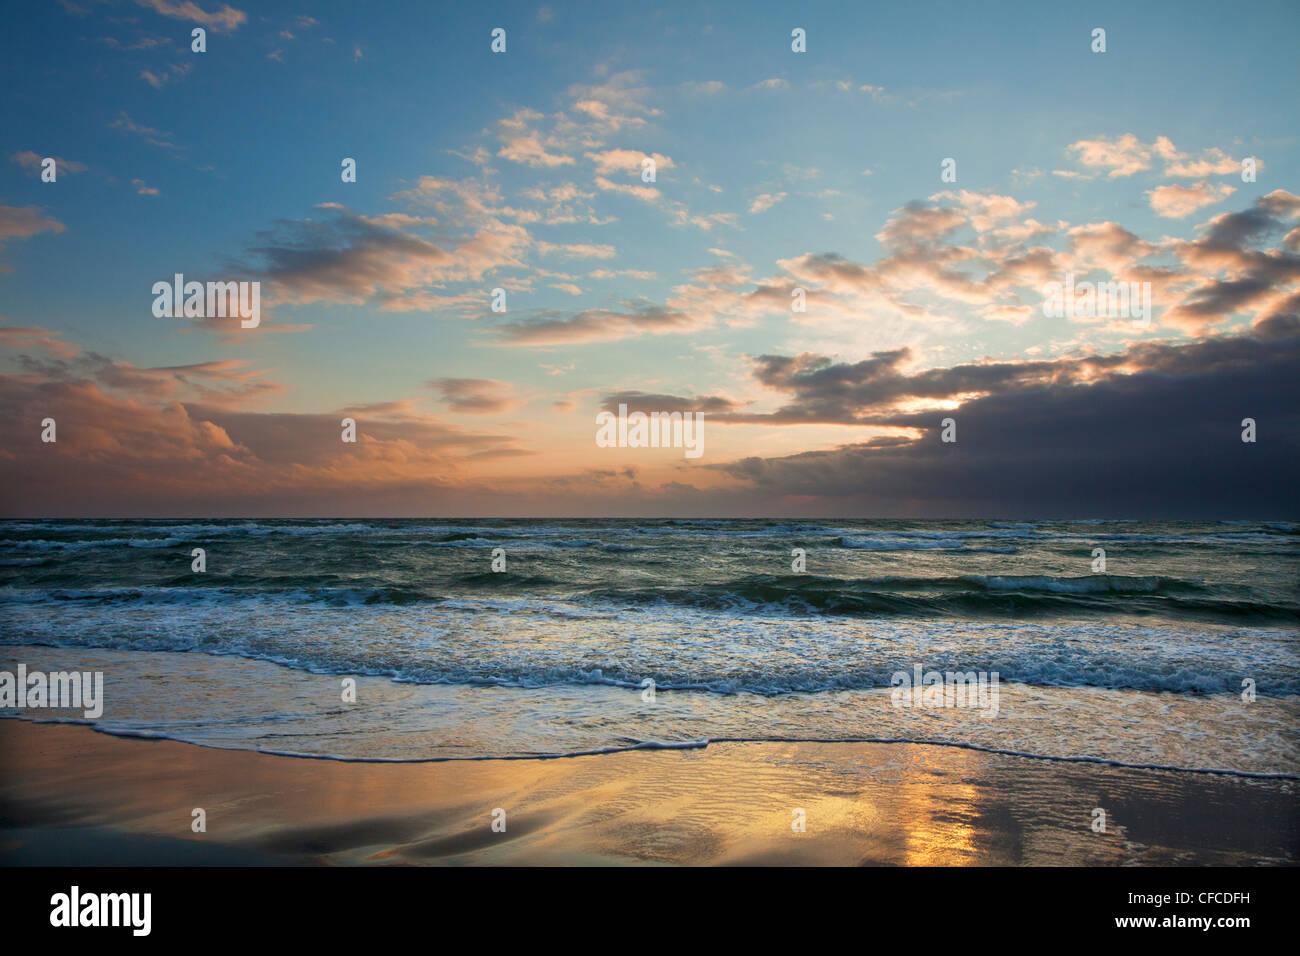 Darss plage ouest au crépuscule, Fischland-Darss-Zingst, mer Baltique, Schleswig-Holstein, Allemagne Banque D'Images